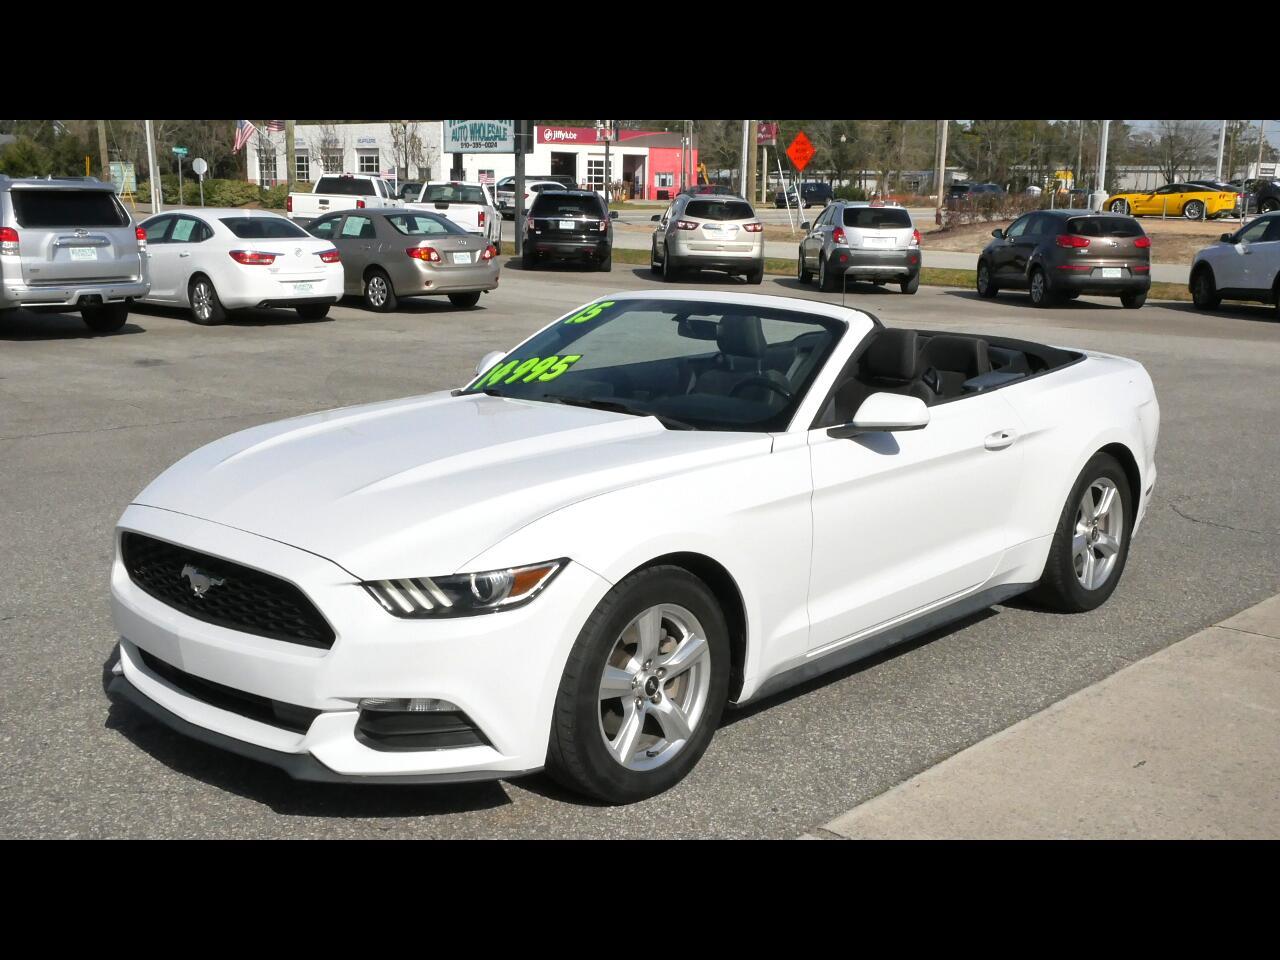 Ford Mustang 2dr Conv V6 2015